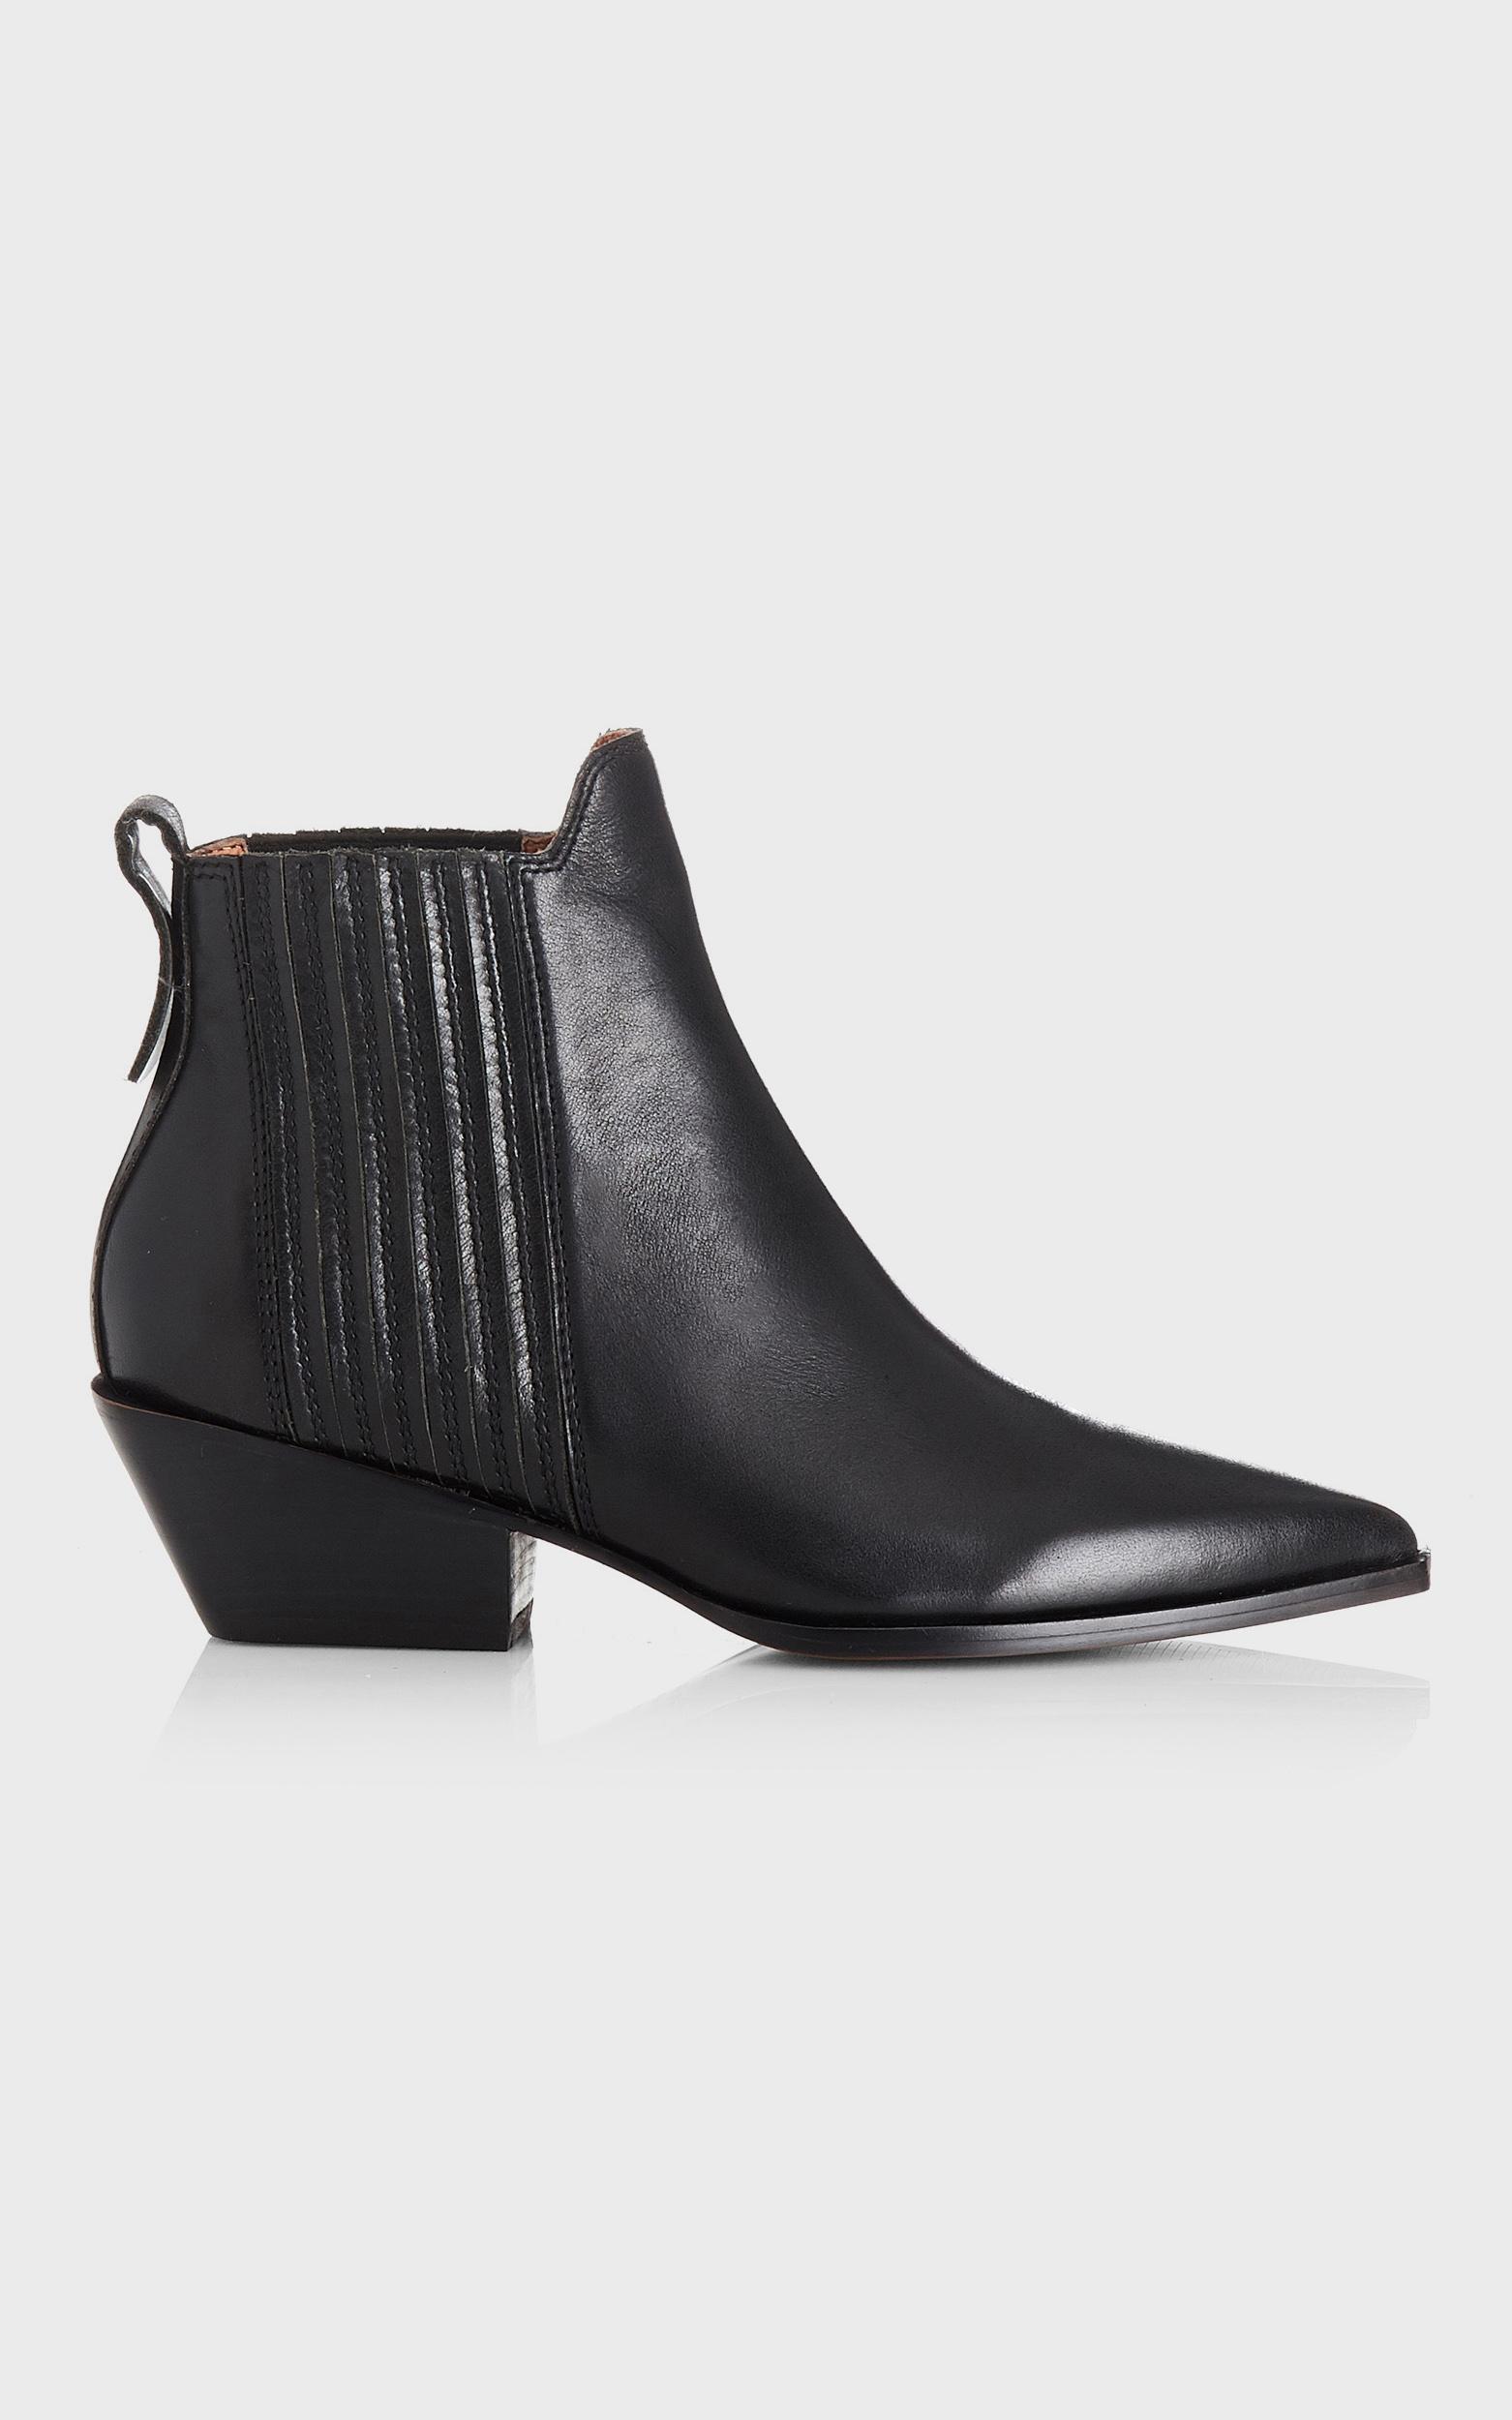 Alias Mae - Seth Boots in Black Burnished - 5.5, BLK1, hi-res image number null